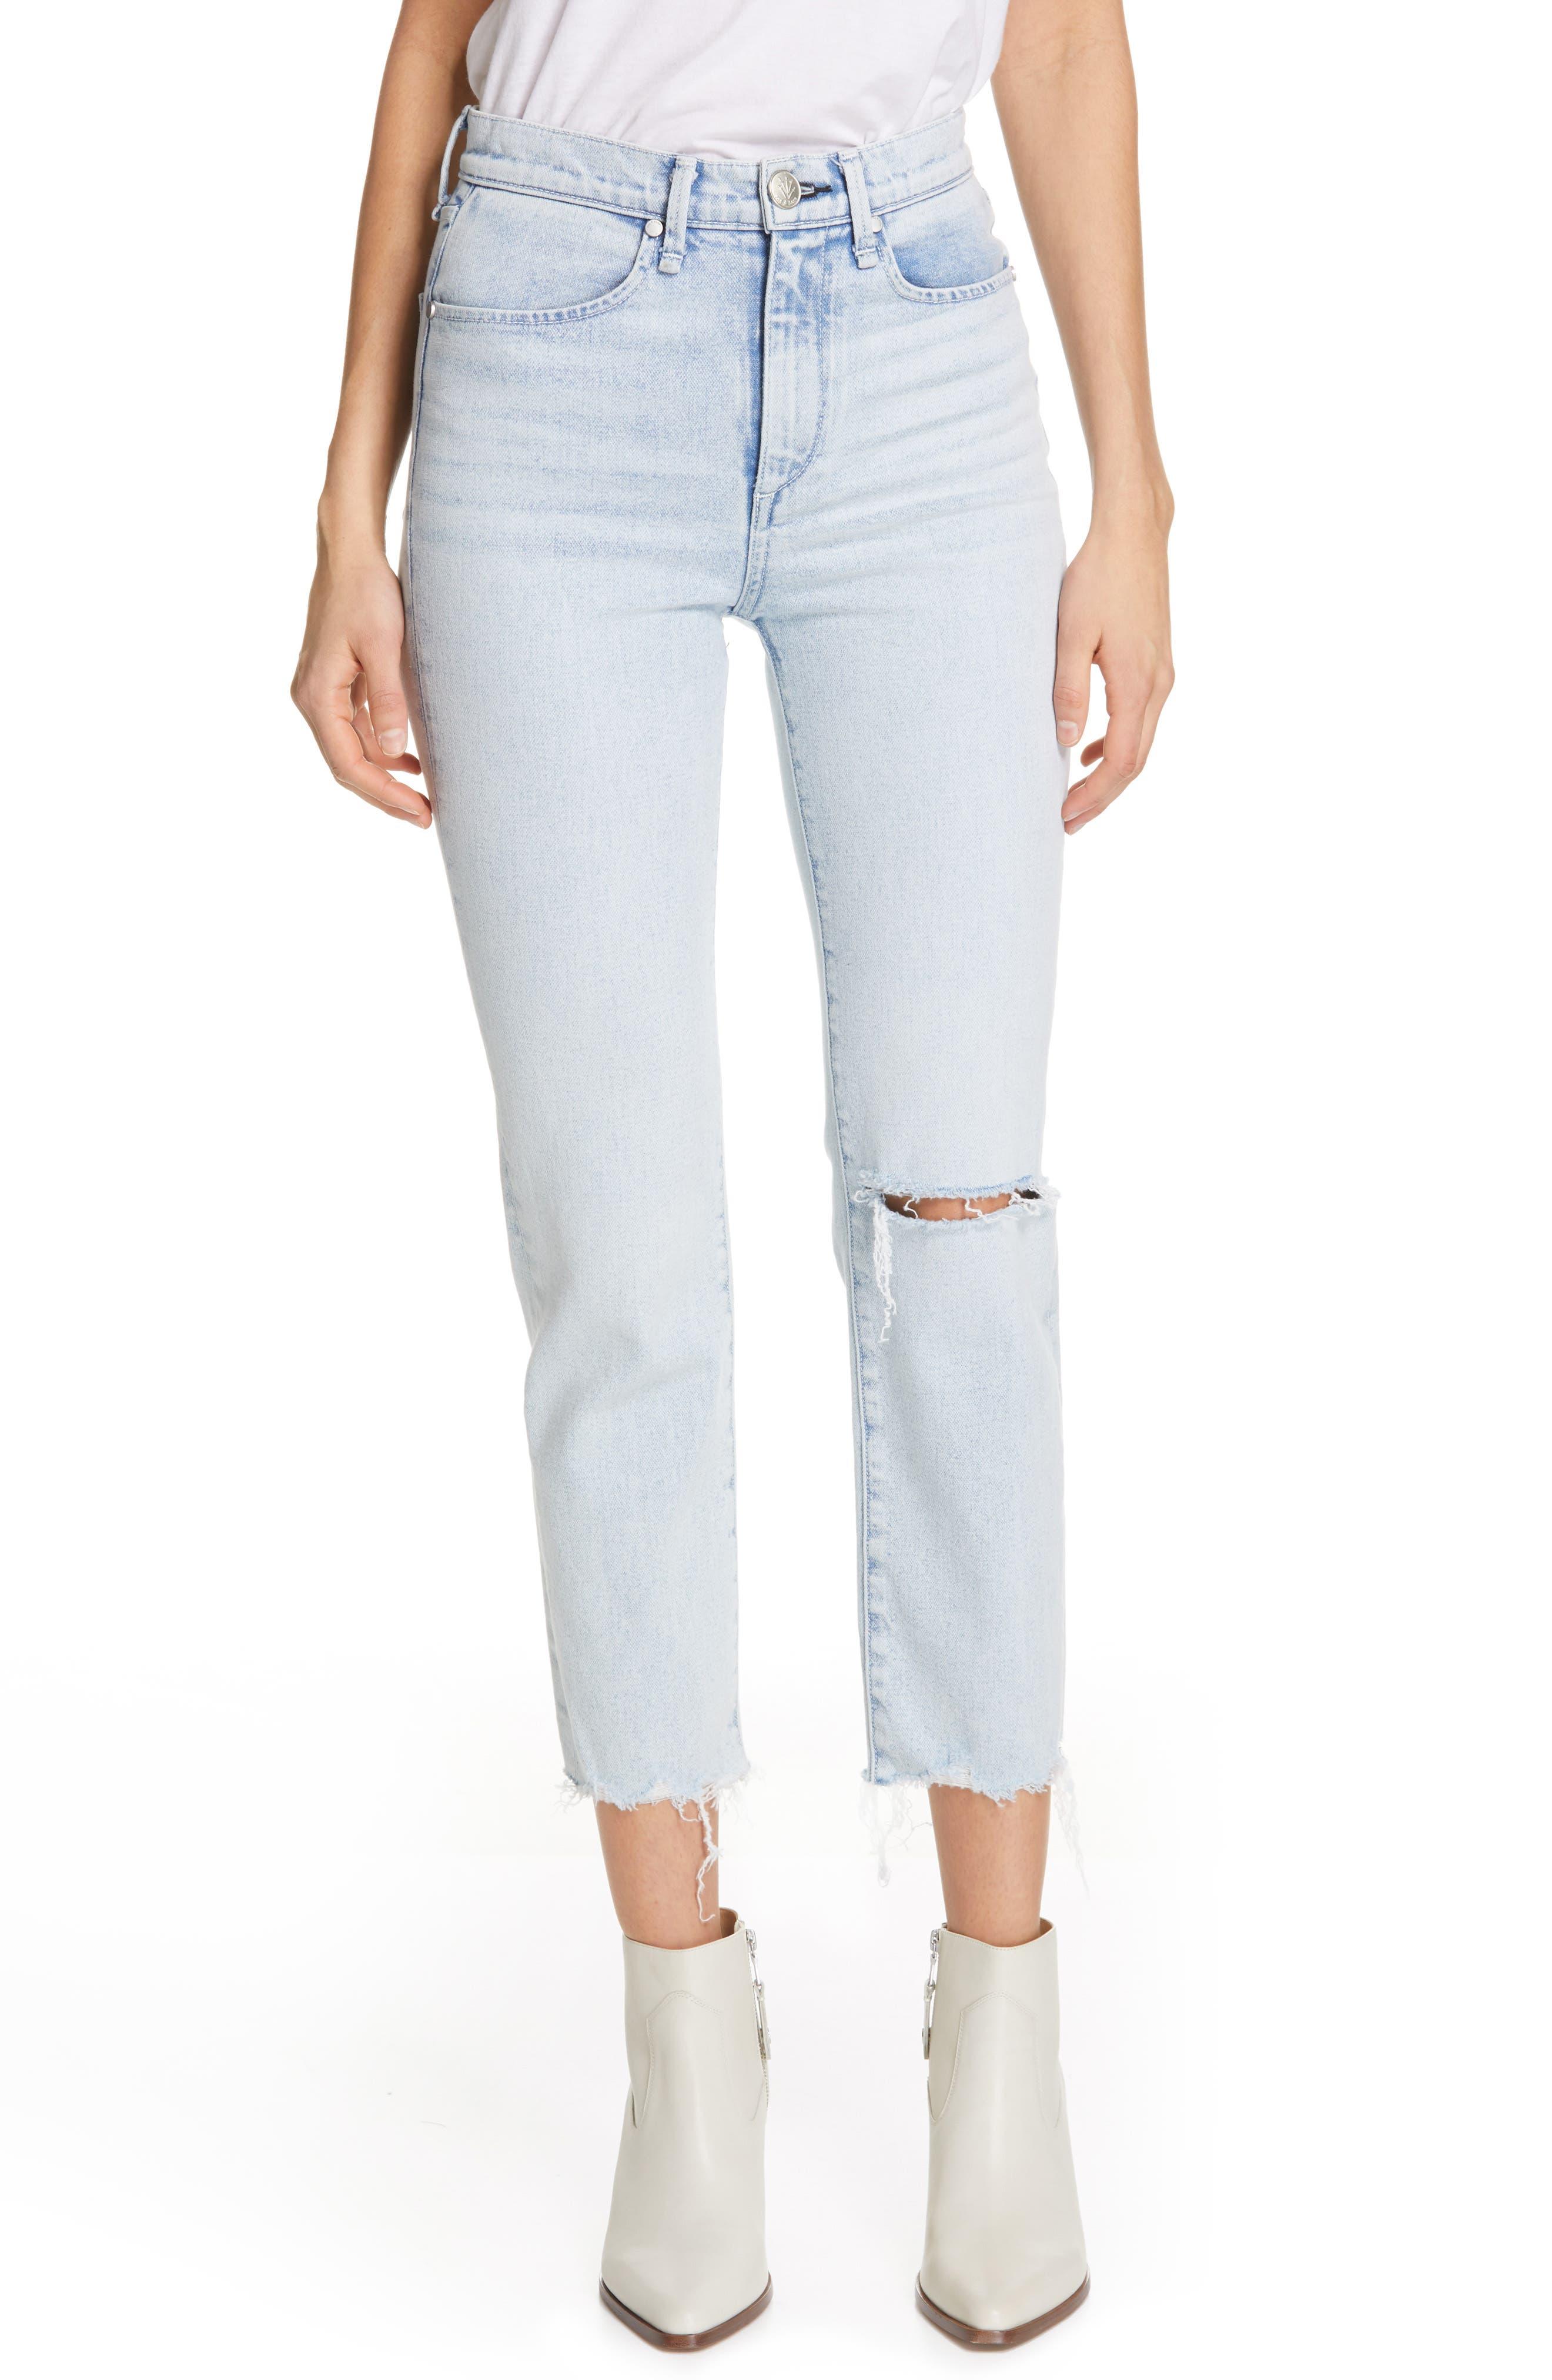 RAG & BONE, JEAN High Waist Ripped Ankle Cigarette Jeans, Main thumbnail 1, color, 450